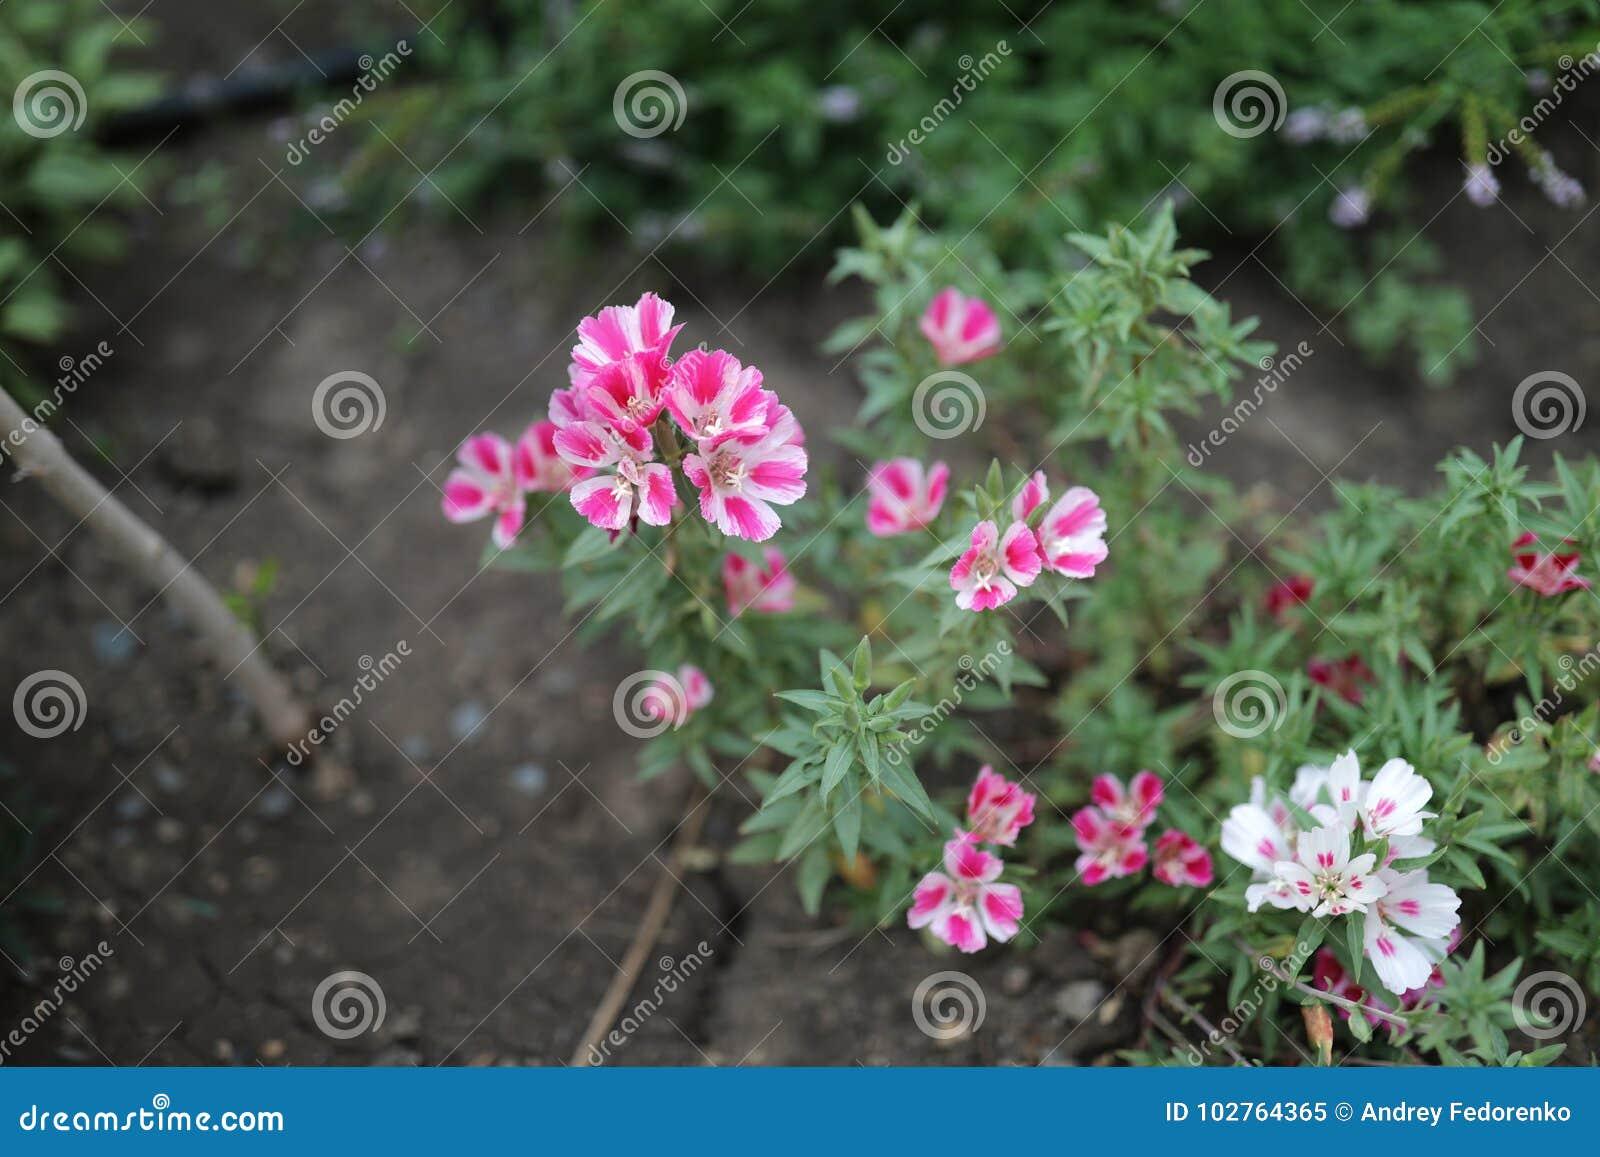 Carnation Stock Image Image Of Garden Love Decor 102764365